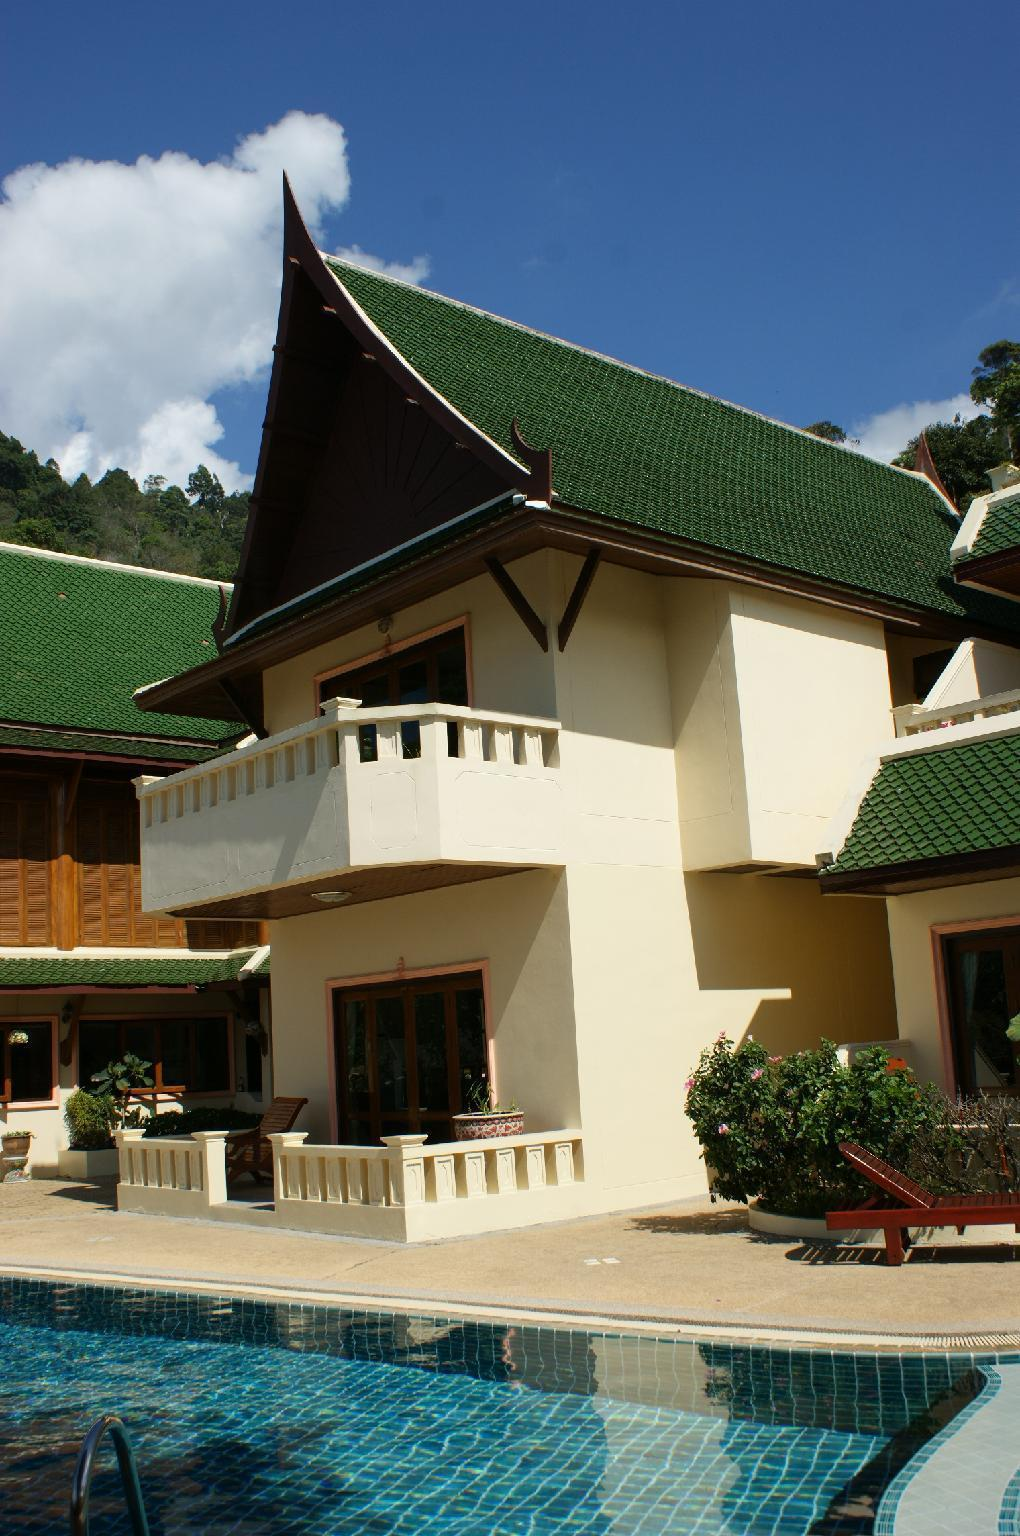 The Thai House at Prince Edouard Resort วิลลา 2 ห้องนอน 3 ห้องน้ำส่วนตัว ขนาด 170 ตร.ม. – ป่าตอง